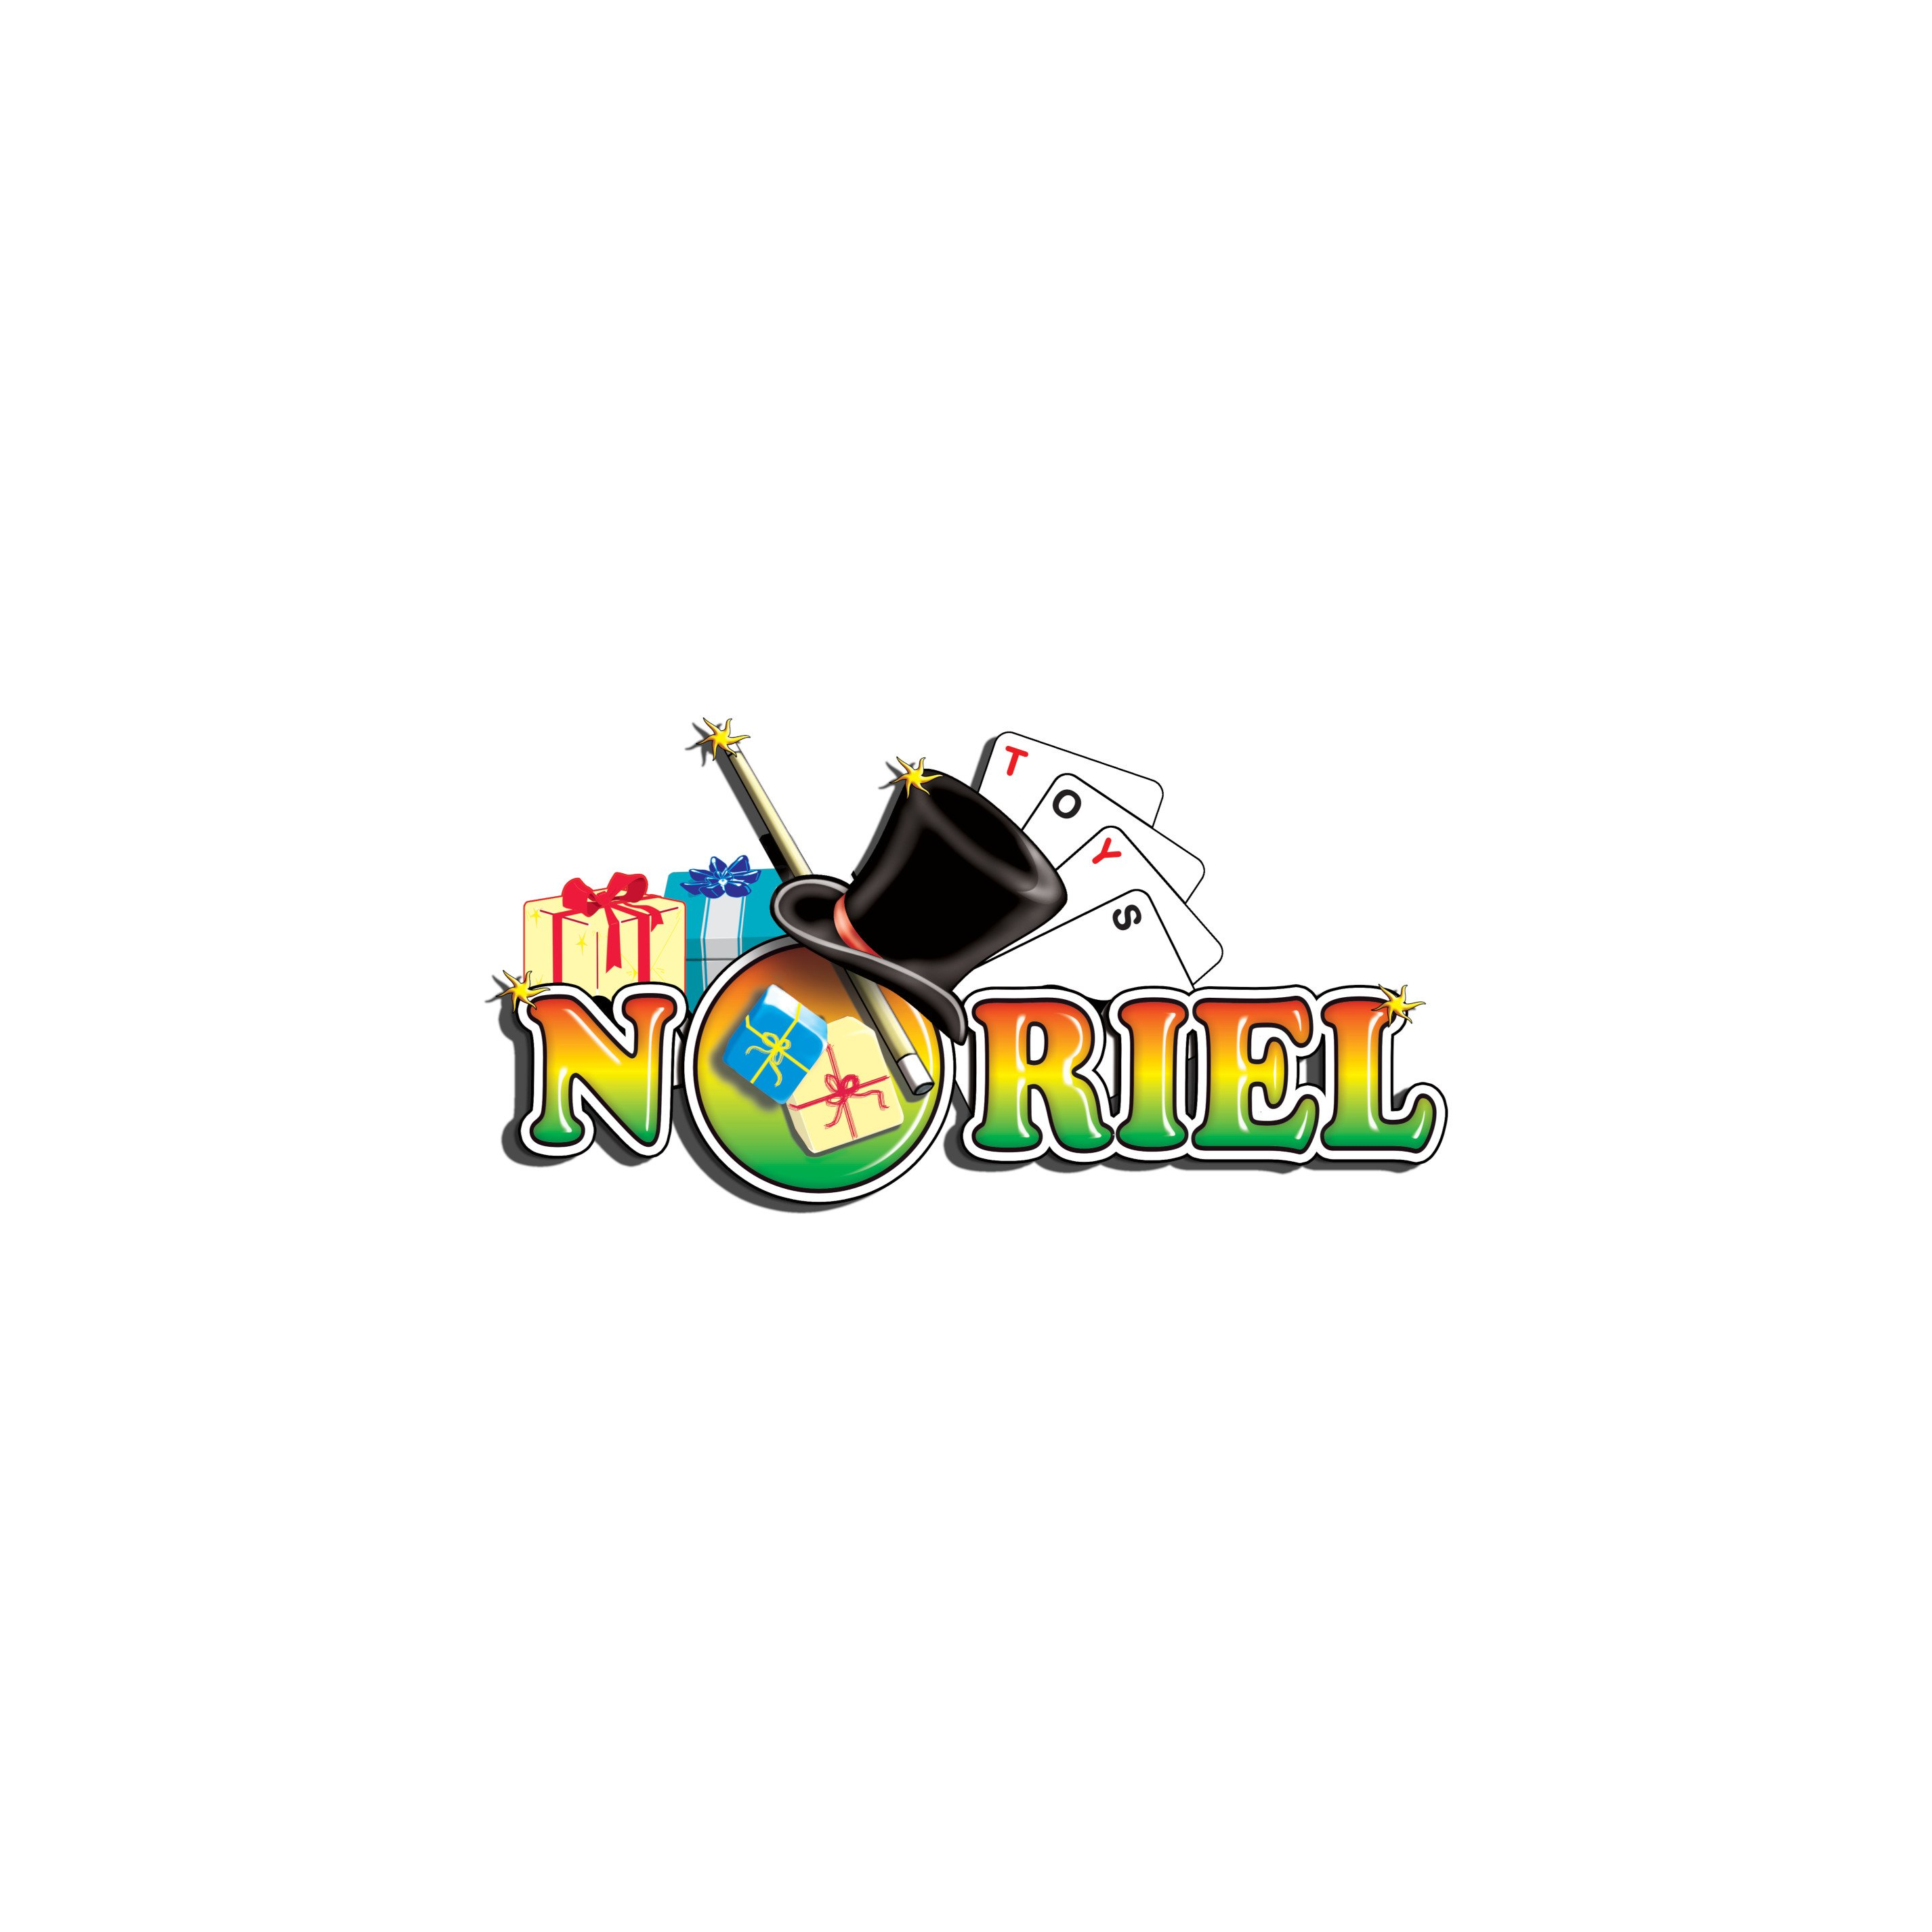 DK000562445_001w Jucarie interactiva supriza Disney Minnie Mouse